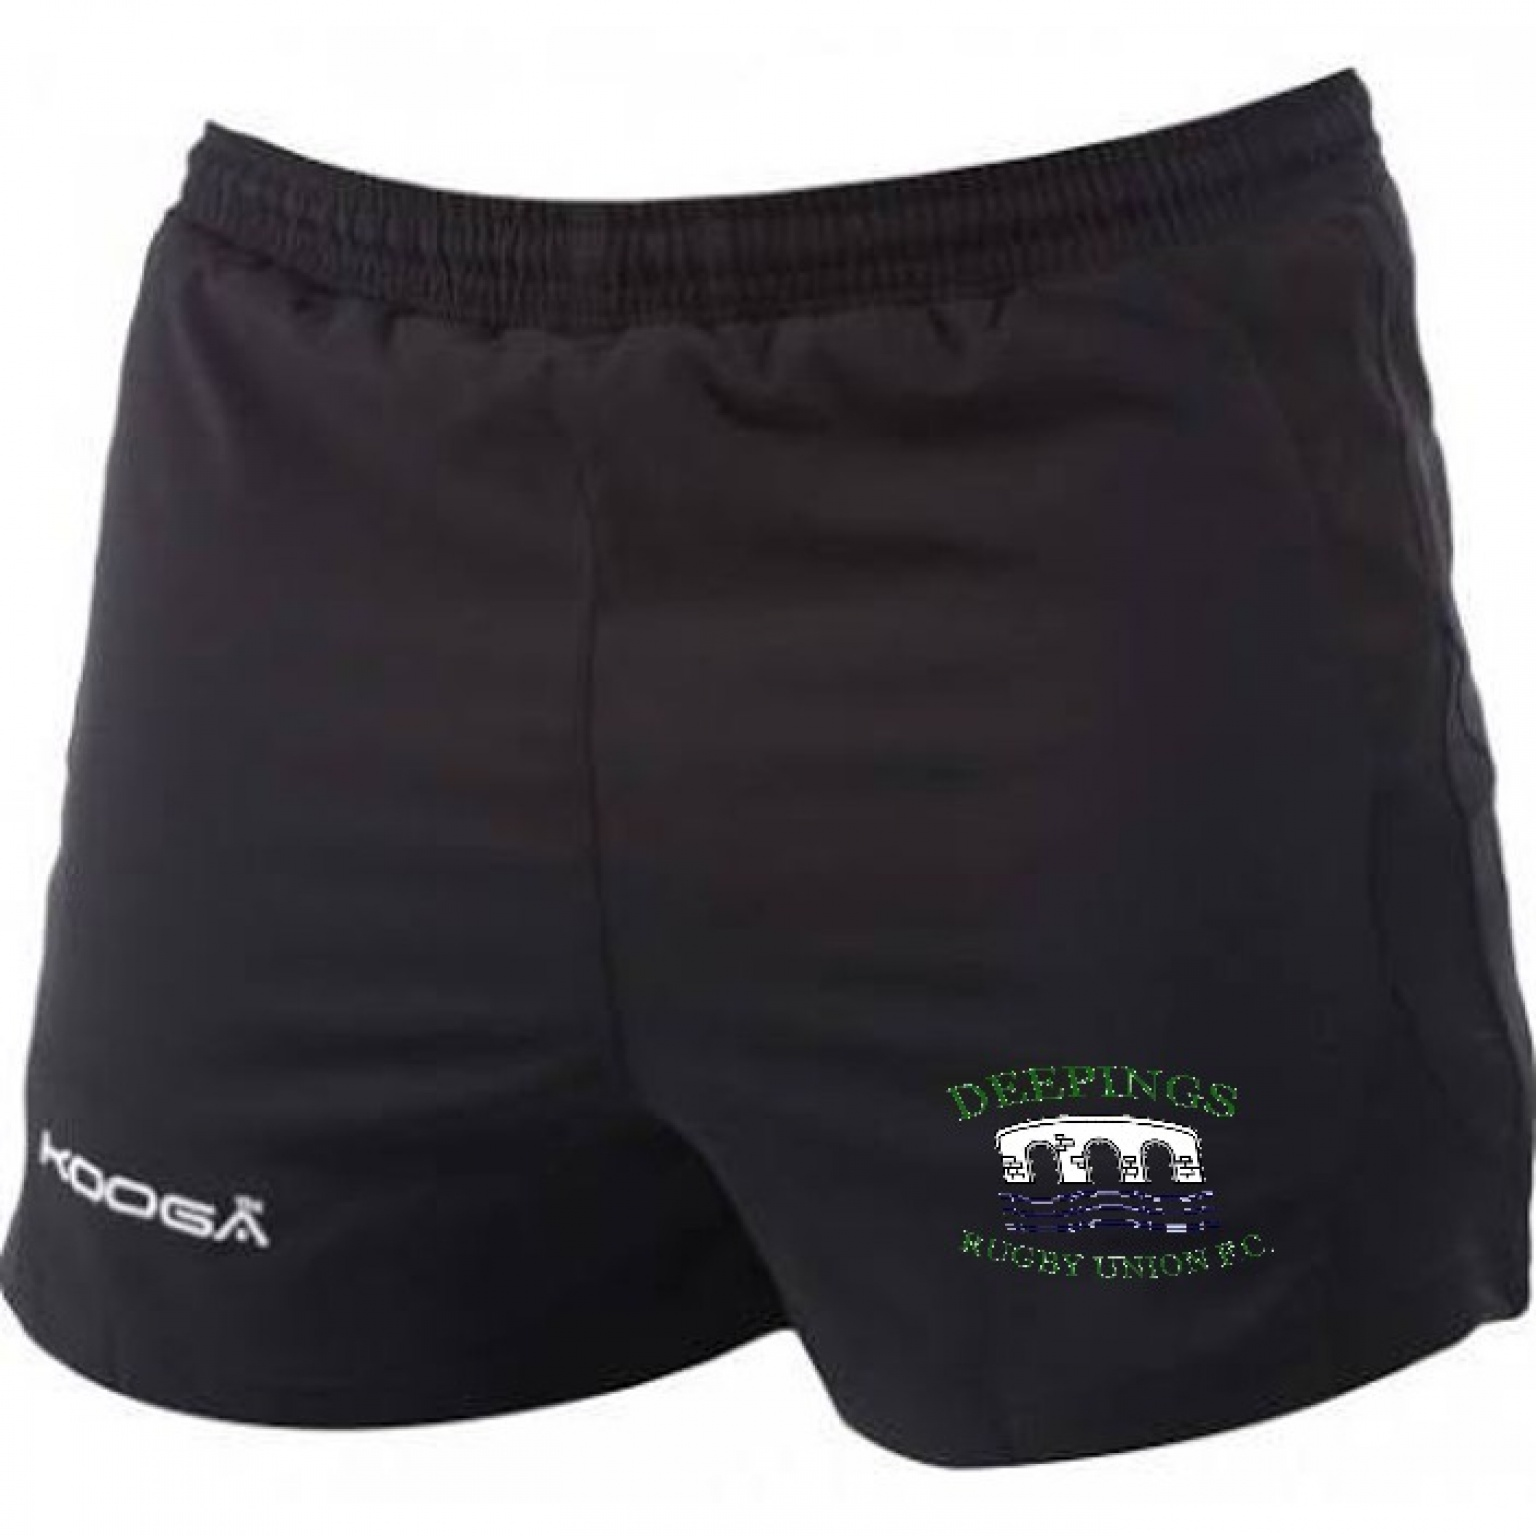 Image: KOOGA Antipodean Shorts